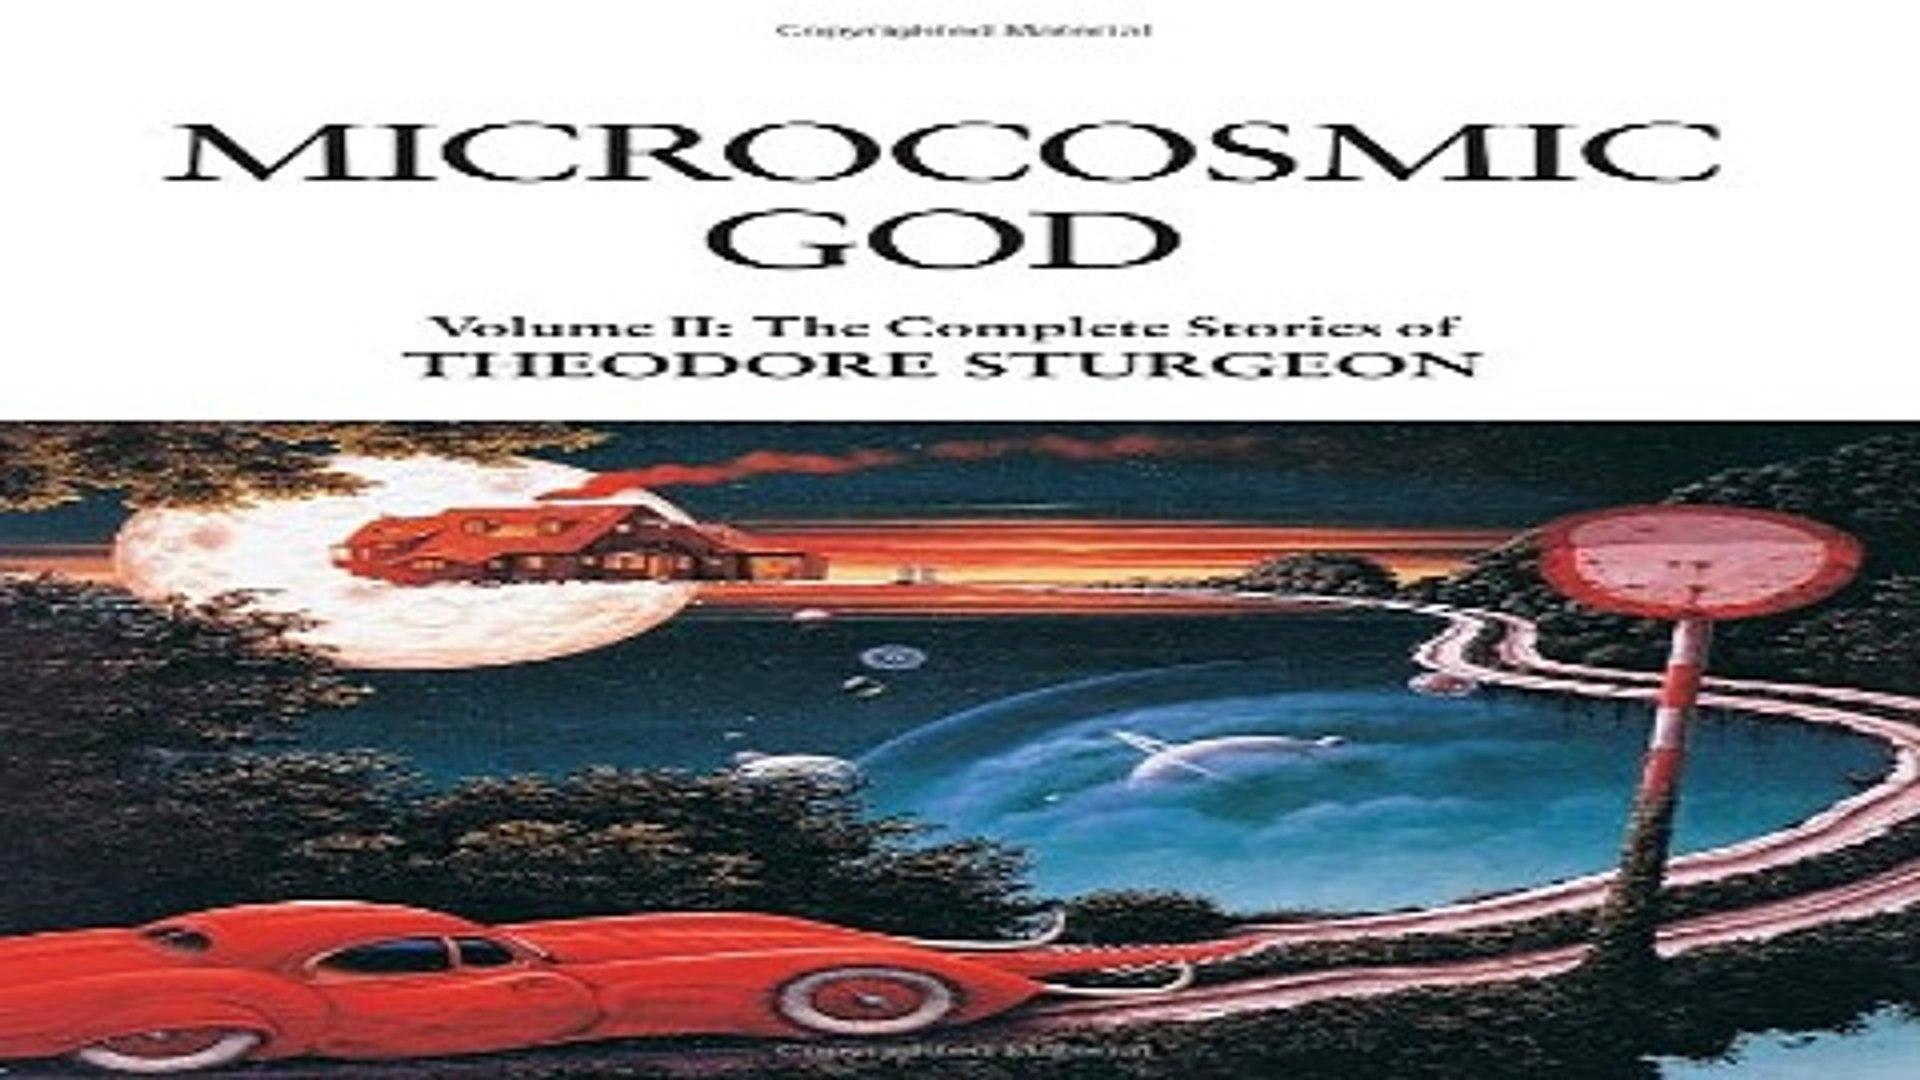 Ebook The Complete Stories Of Theodore Sturgeon Volume Ii Microcosmic God By Theodore Sturgeon